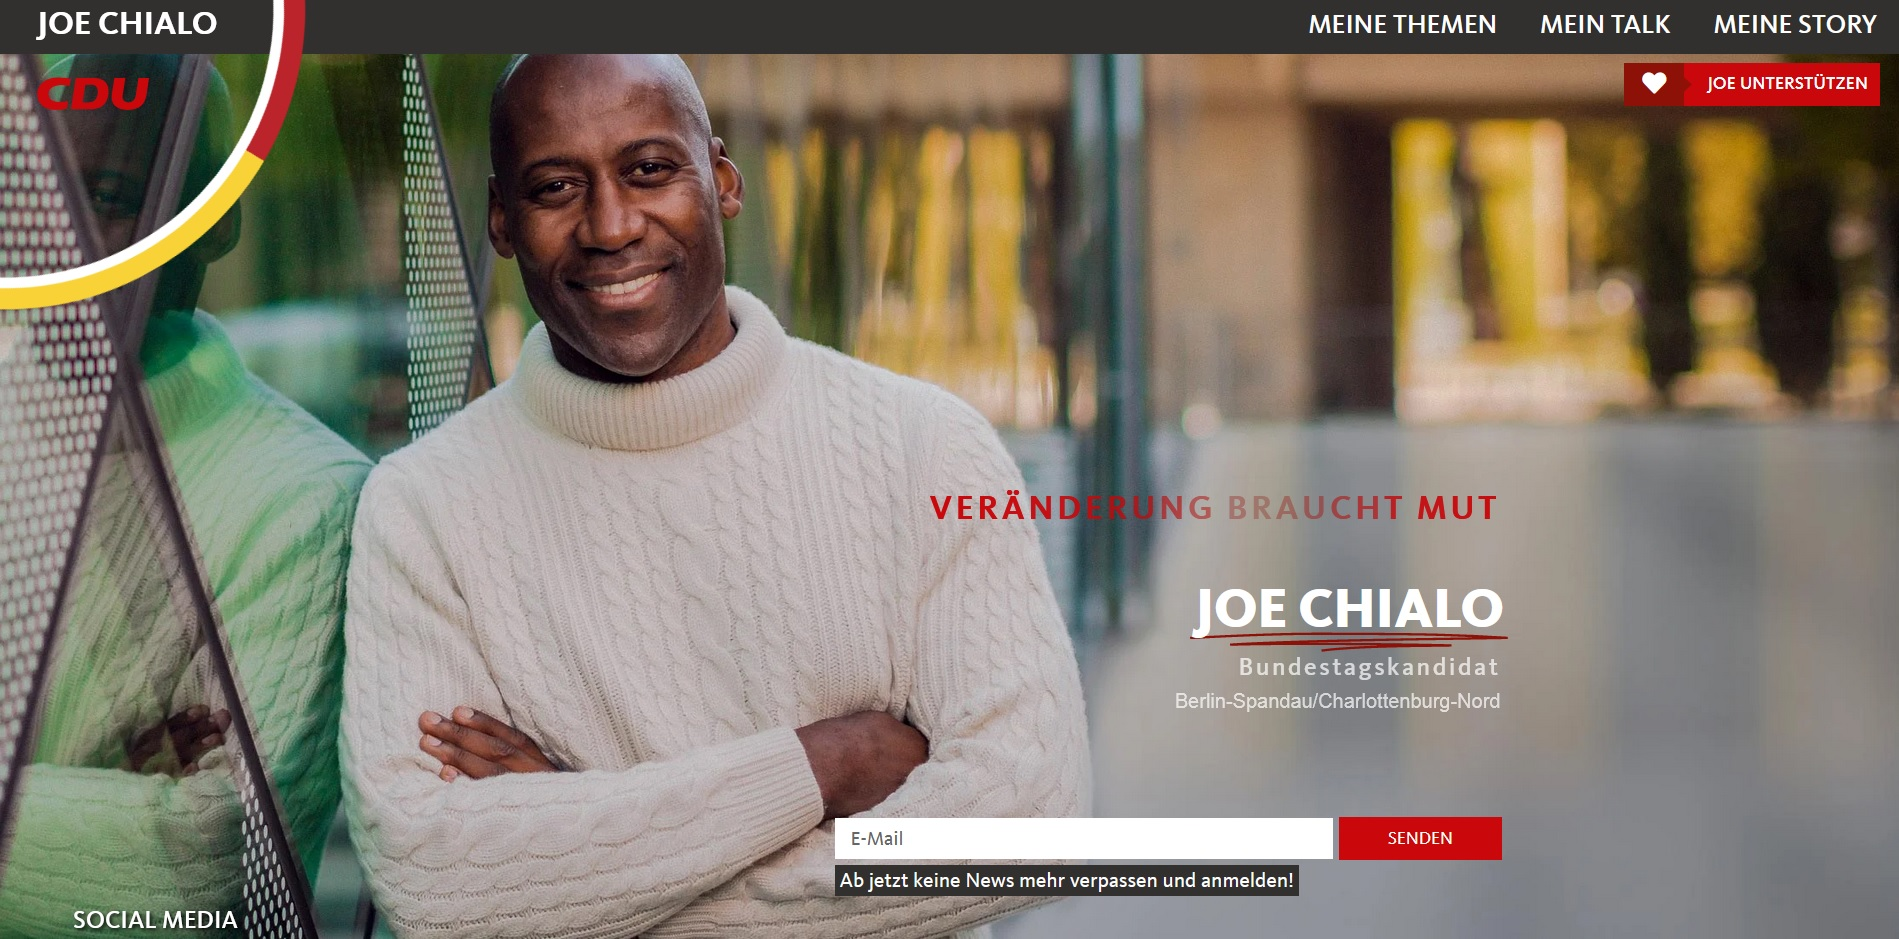 Custom webdesign for Joe Chialo